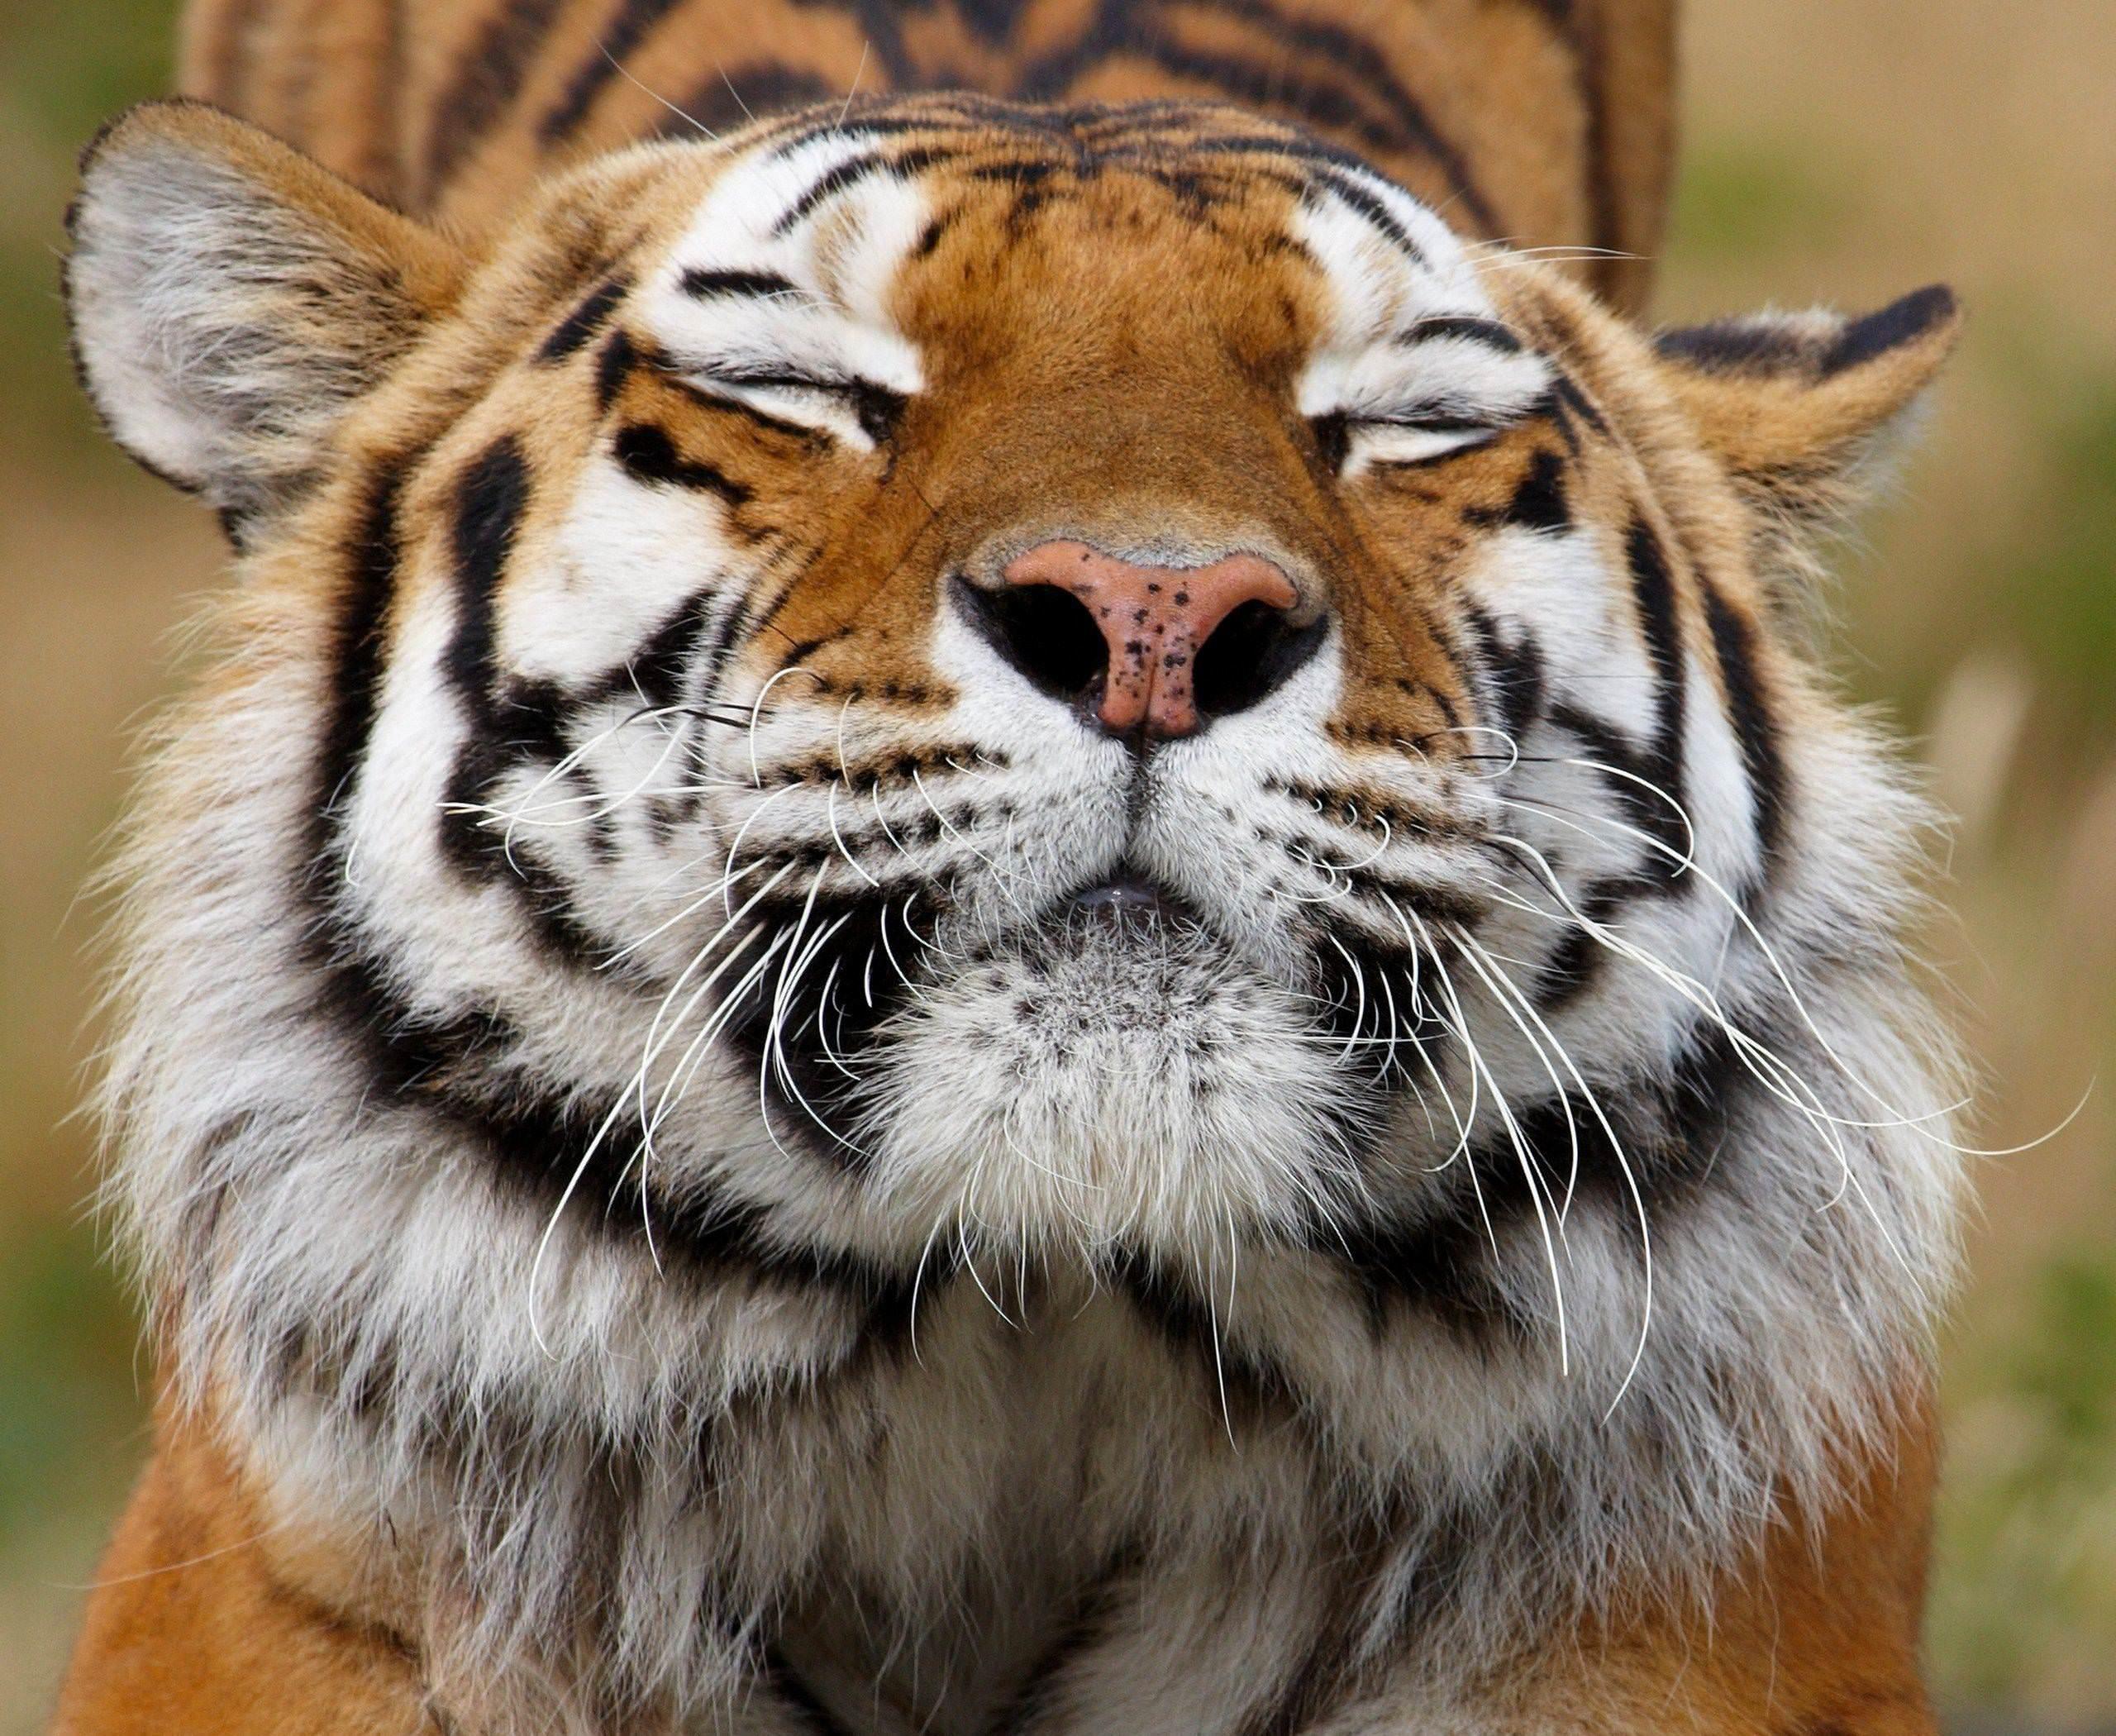 Обои красивая морда тигра на рабочий стол